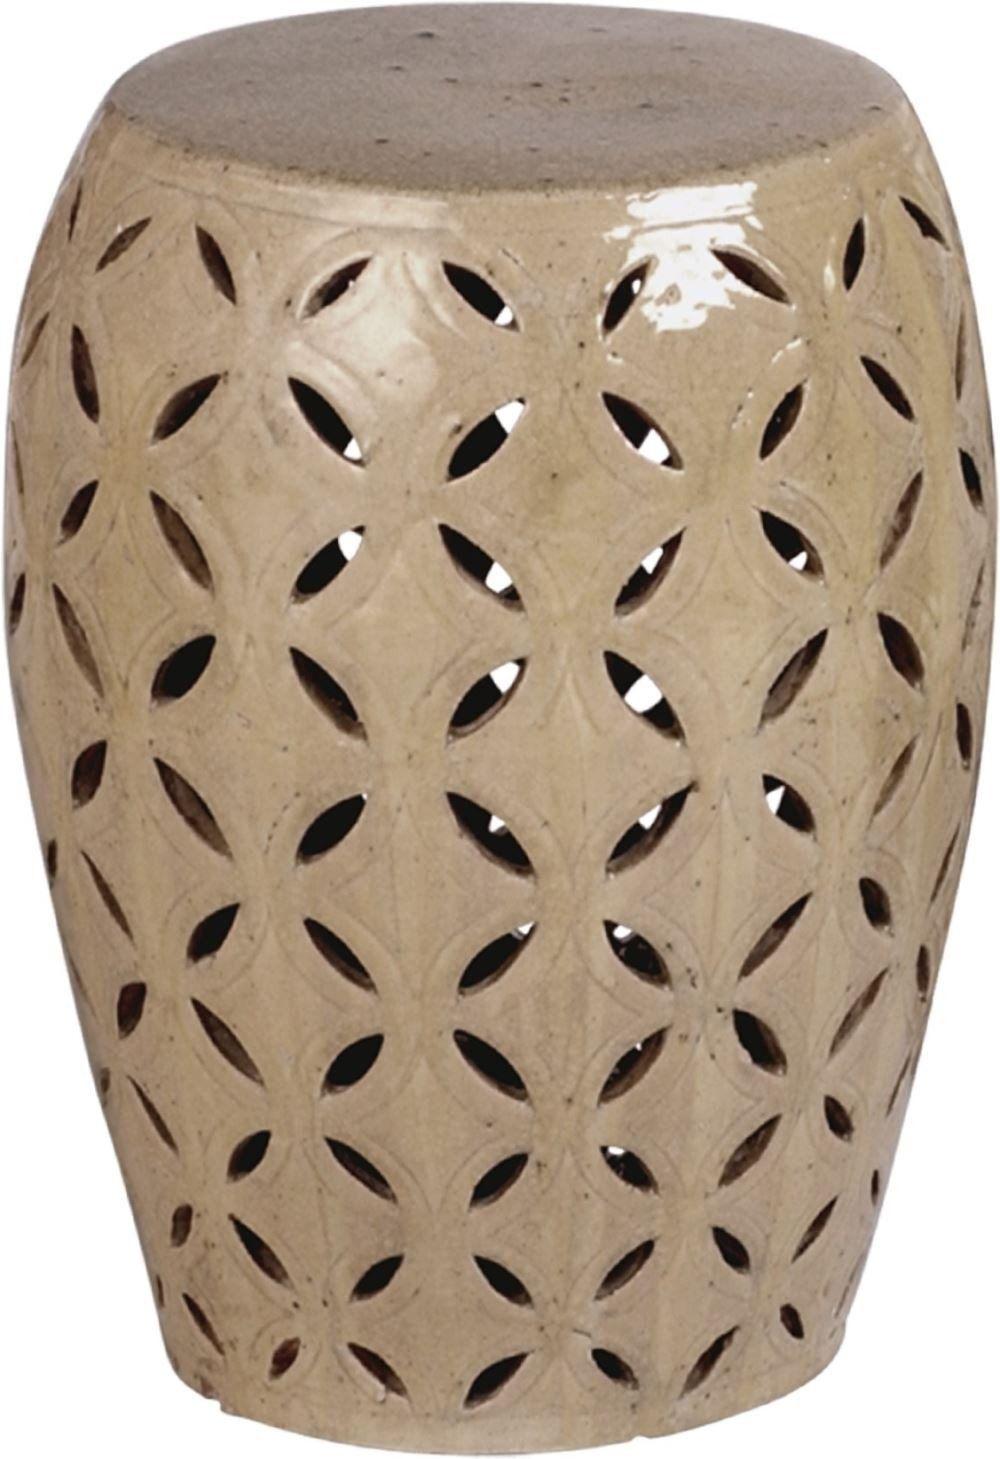 Lattice Stool Table Products Garden Ceramic